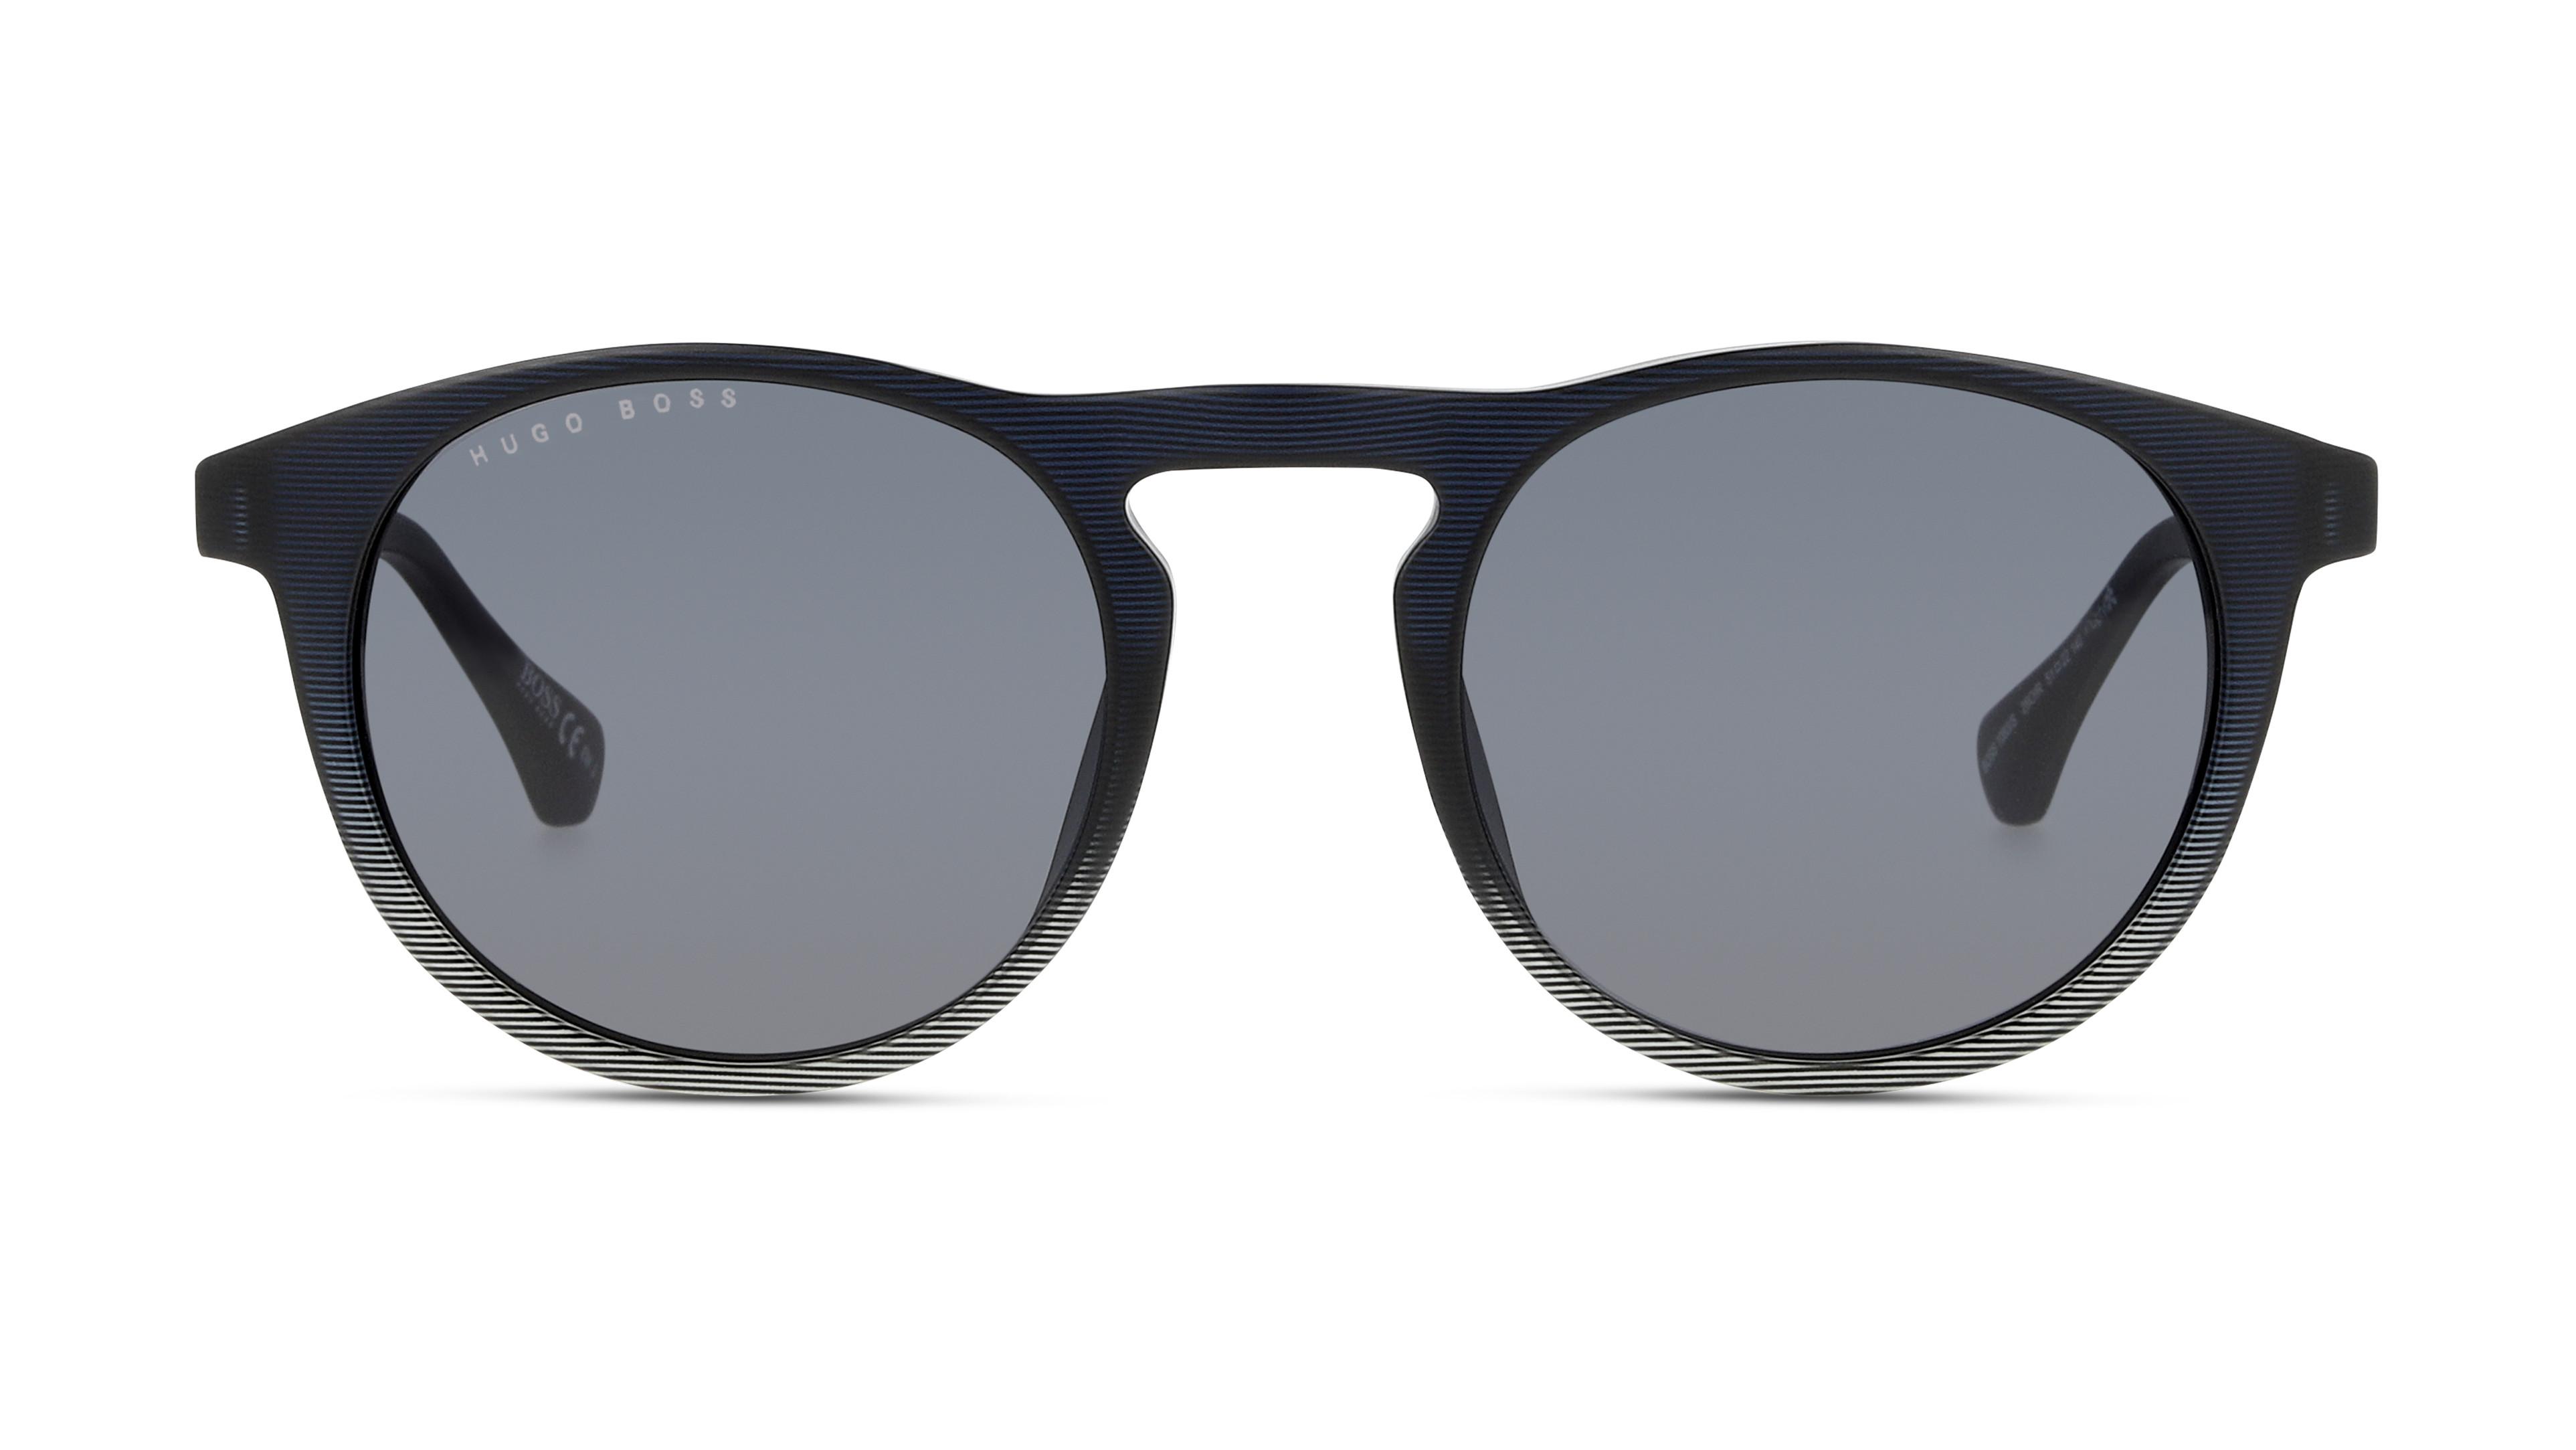 716736178950-front-01-boss-boss-1083-s-eyewear-blue-patt